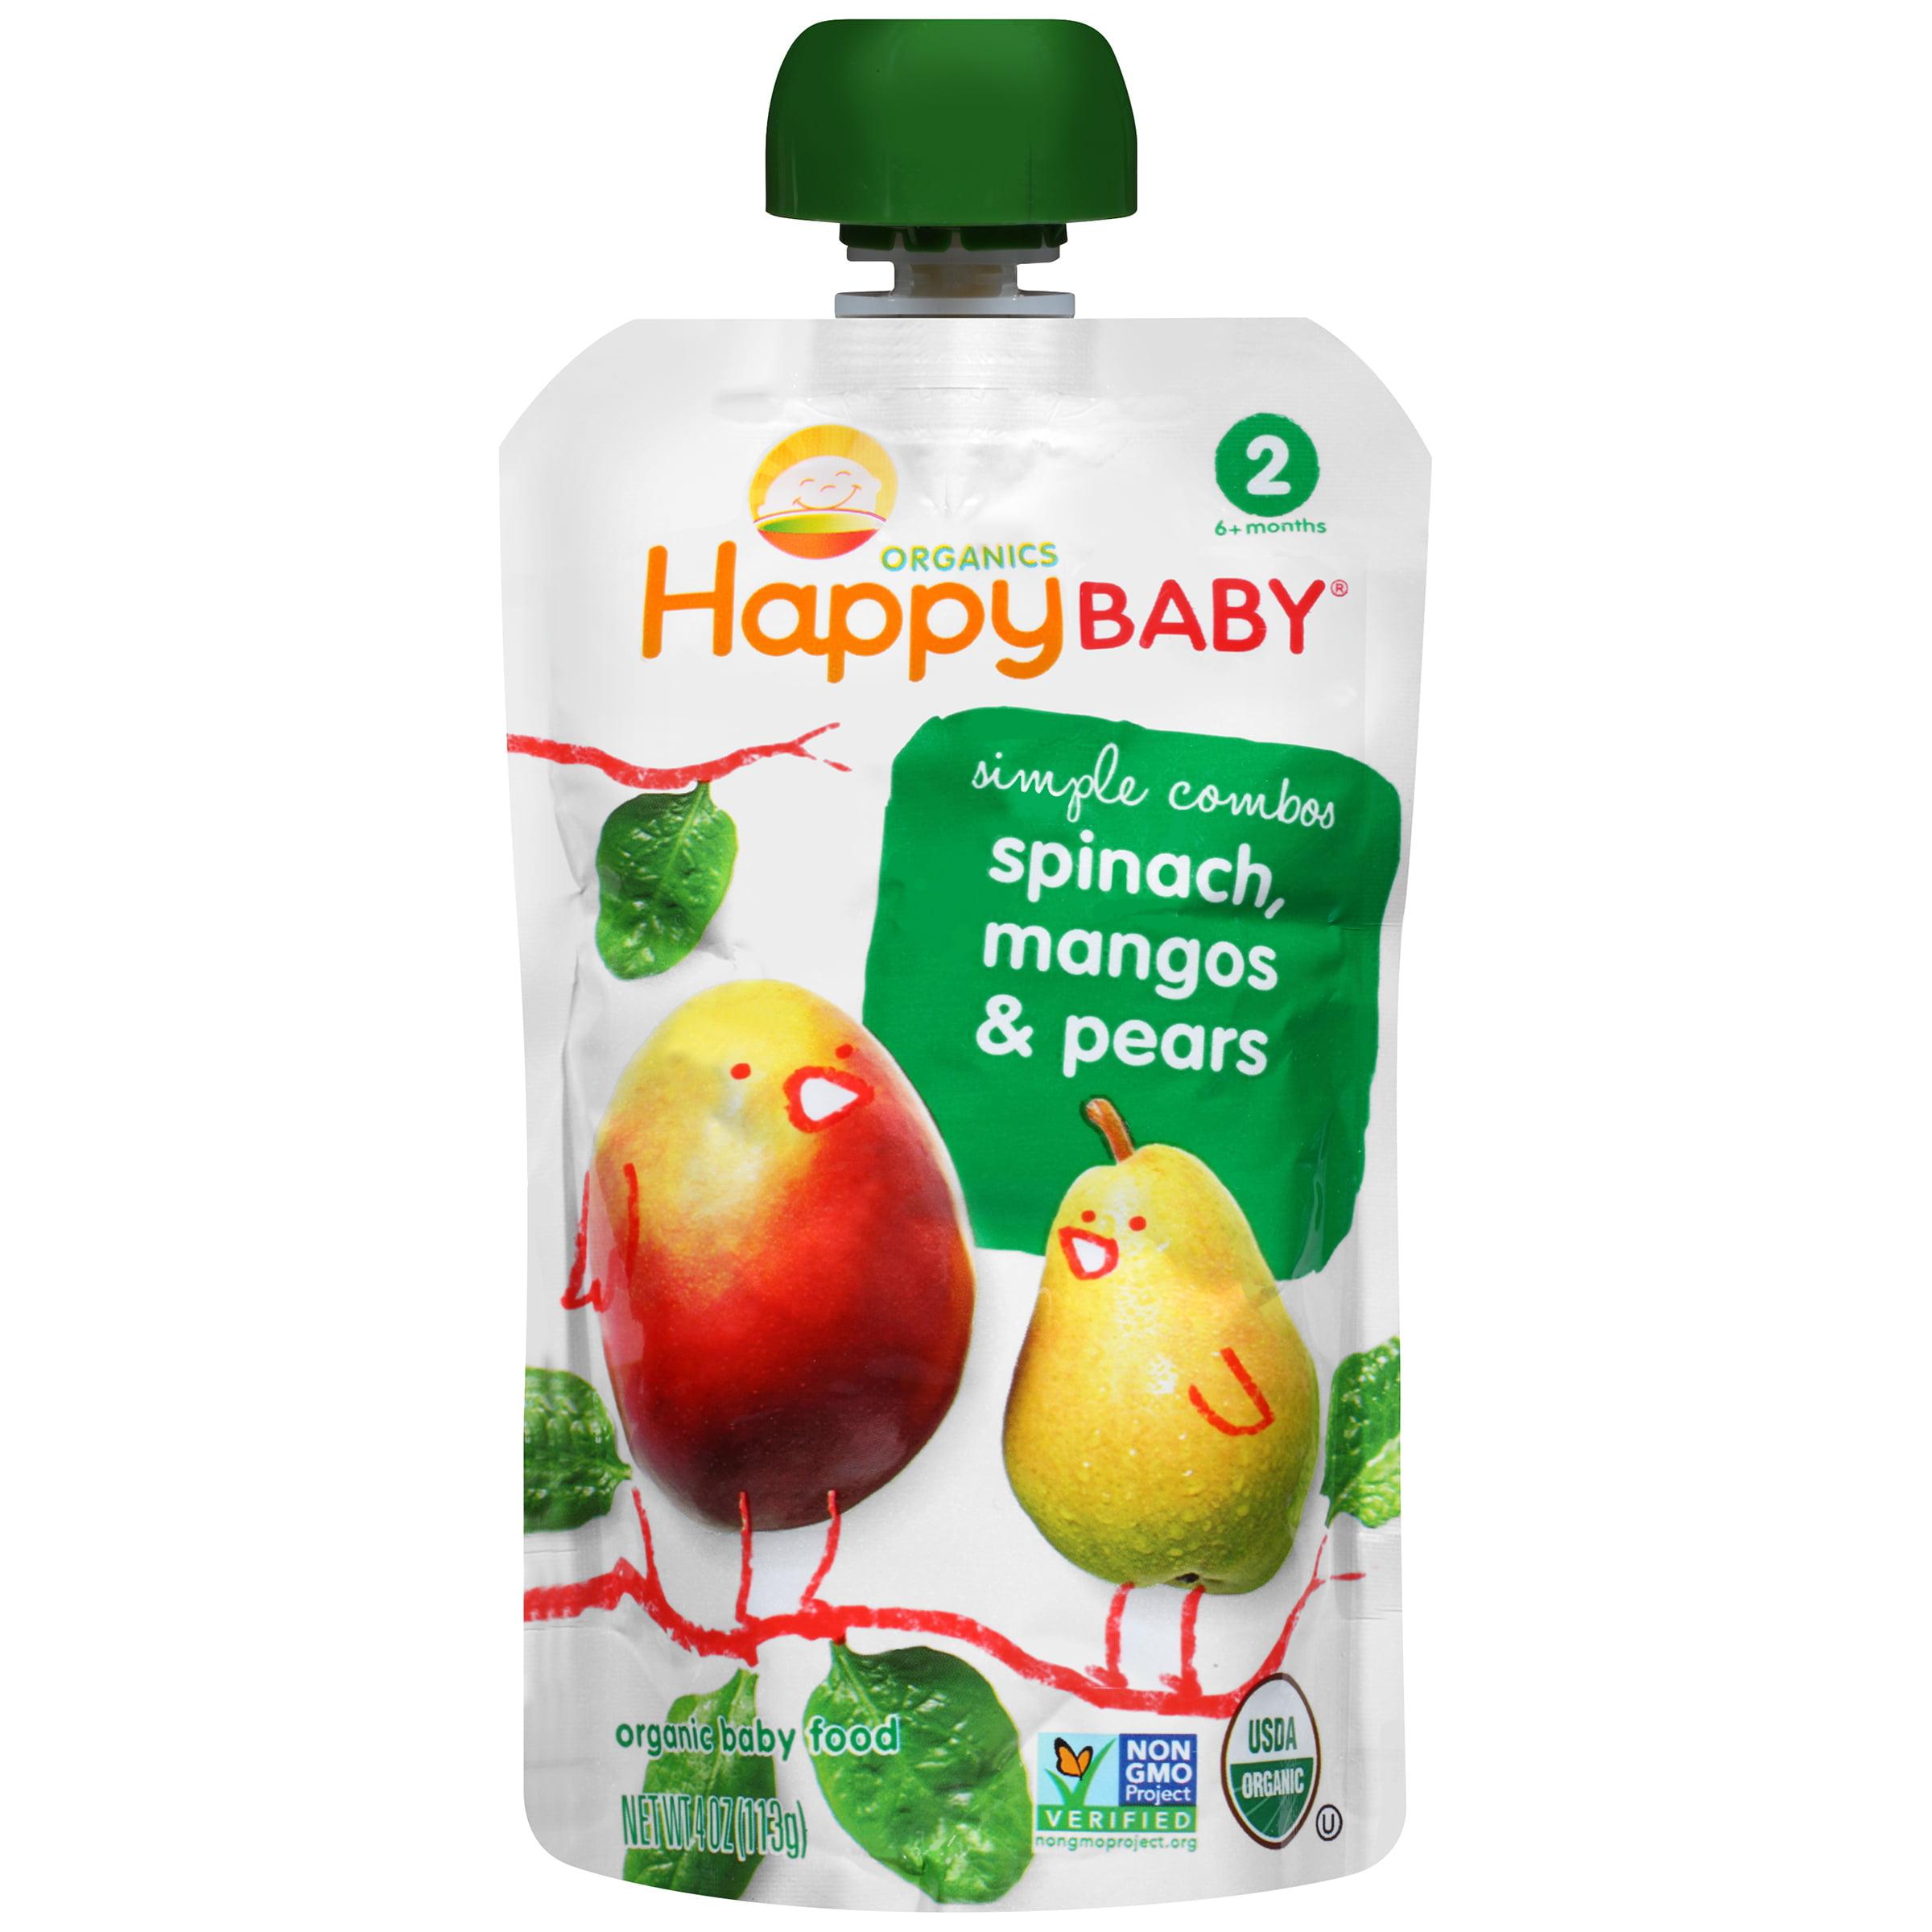 HappyBaby Organics Organic Baby Food Simple Combos 2 Spinach, Mangos & Pears, 4.0 OZ